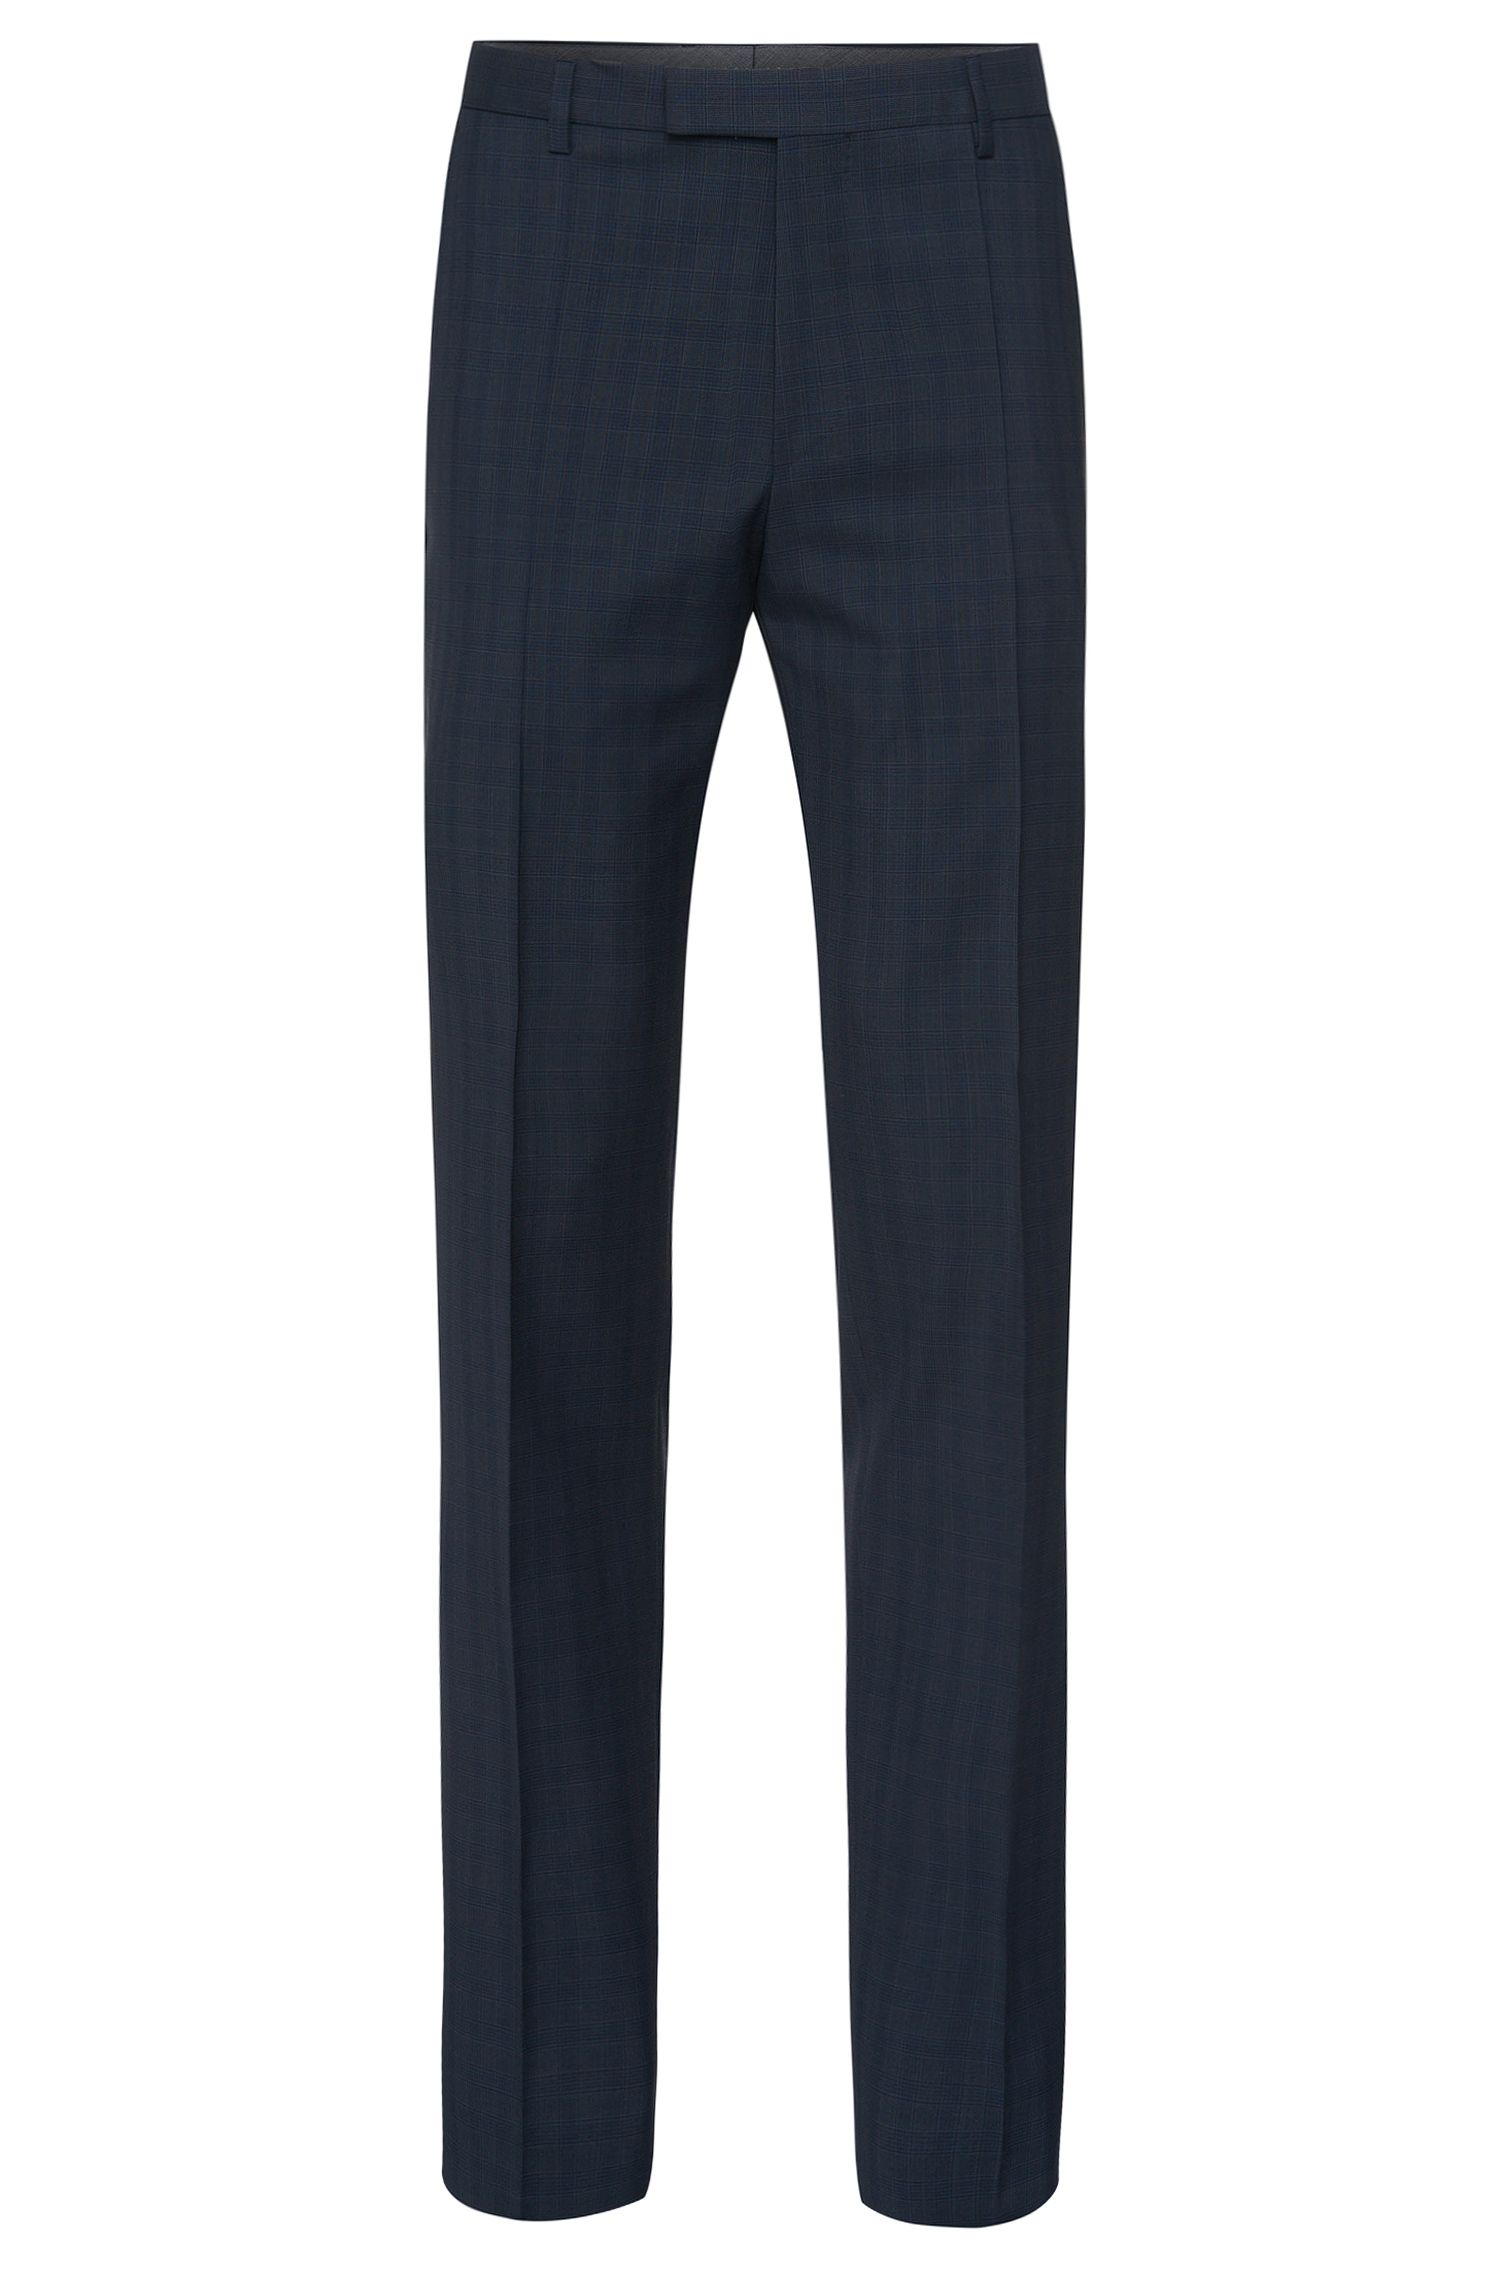 'Leenon' | Regular Fit, Italian Virgin Wool Plaid Dress Pants